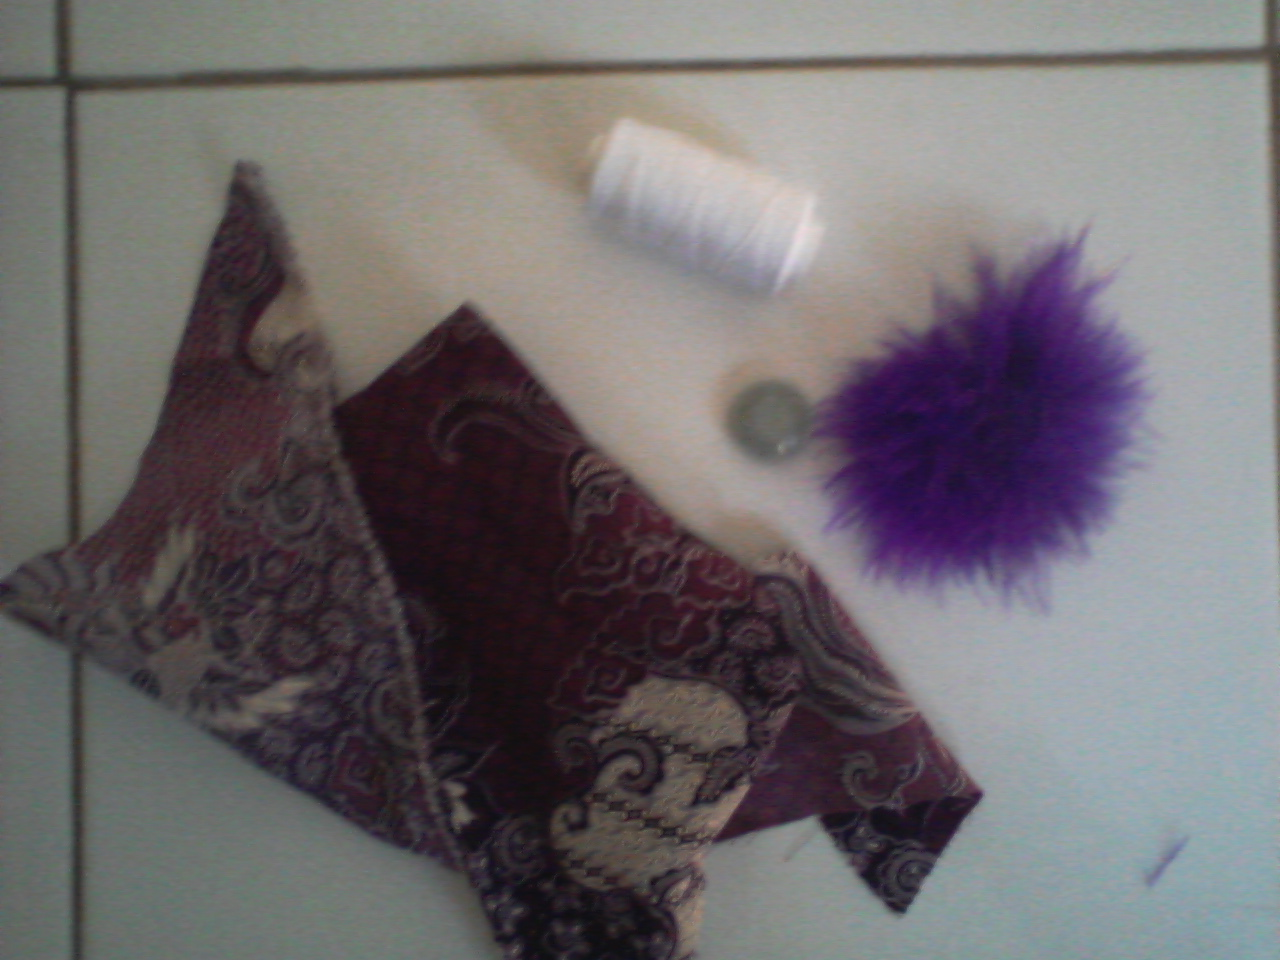 buat pola bulat dengan diameter 7 cm,buat enam buah dan gunting kain